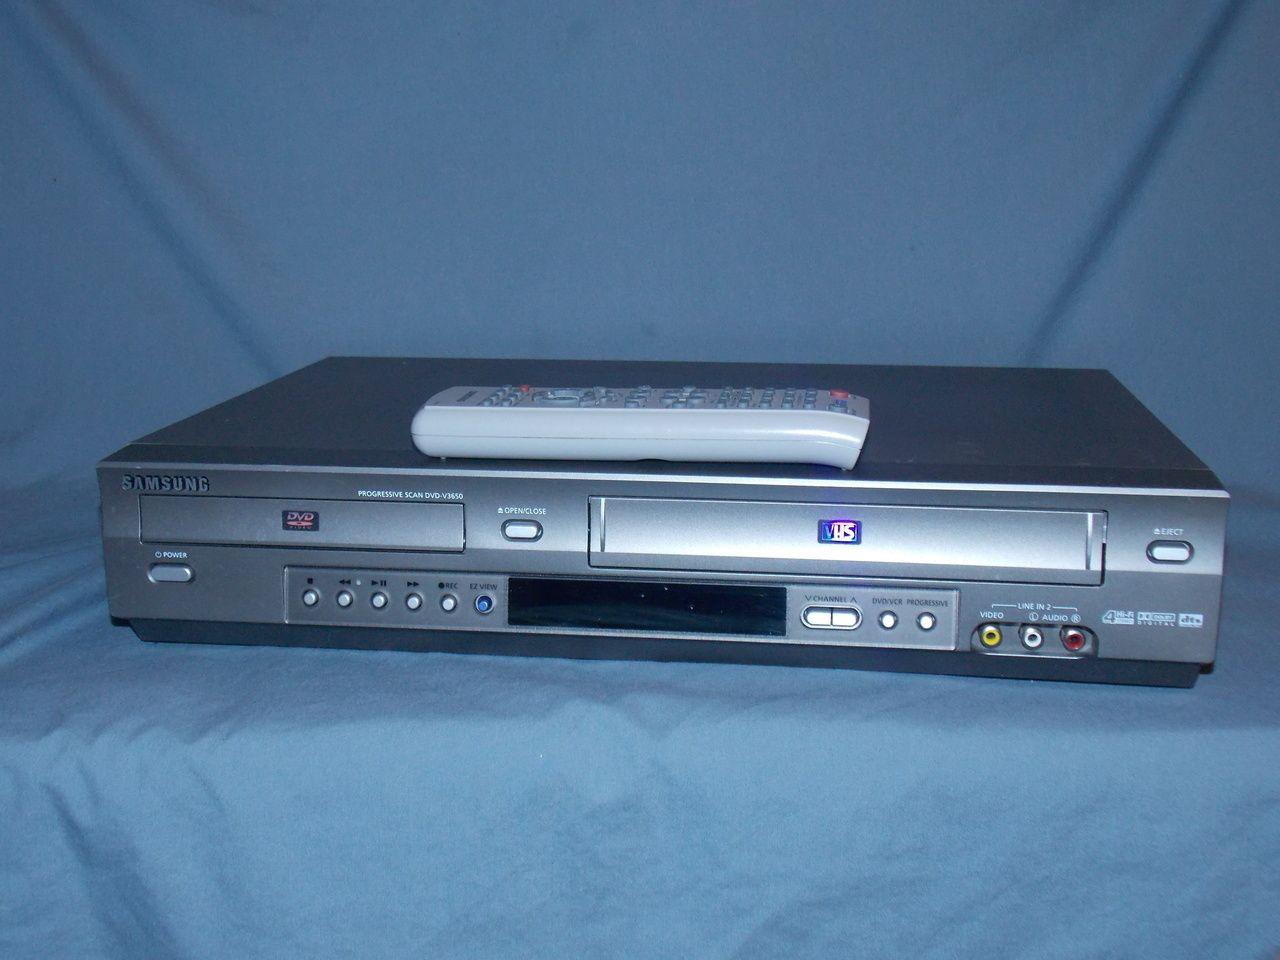 VCR-Players.com - Samsung DVD-V3650 VHS VCR DVD Combo Player w ...